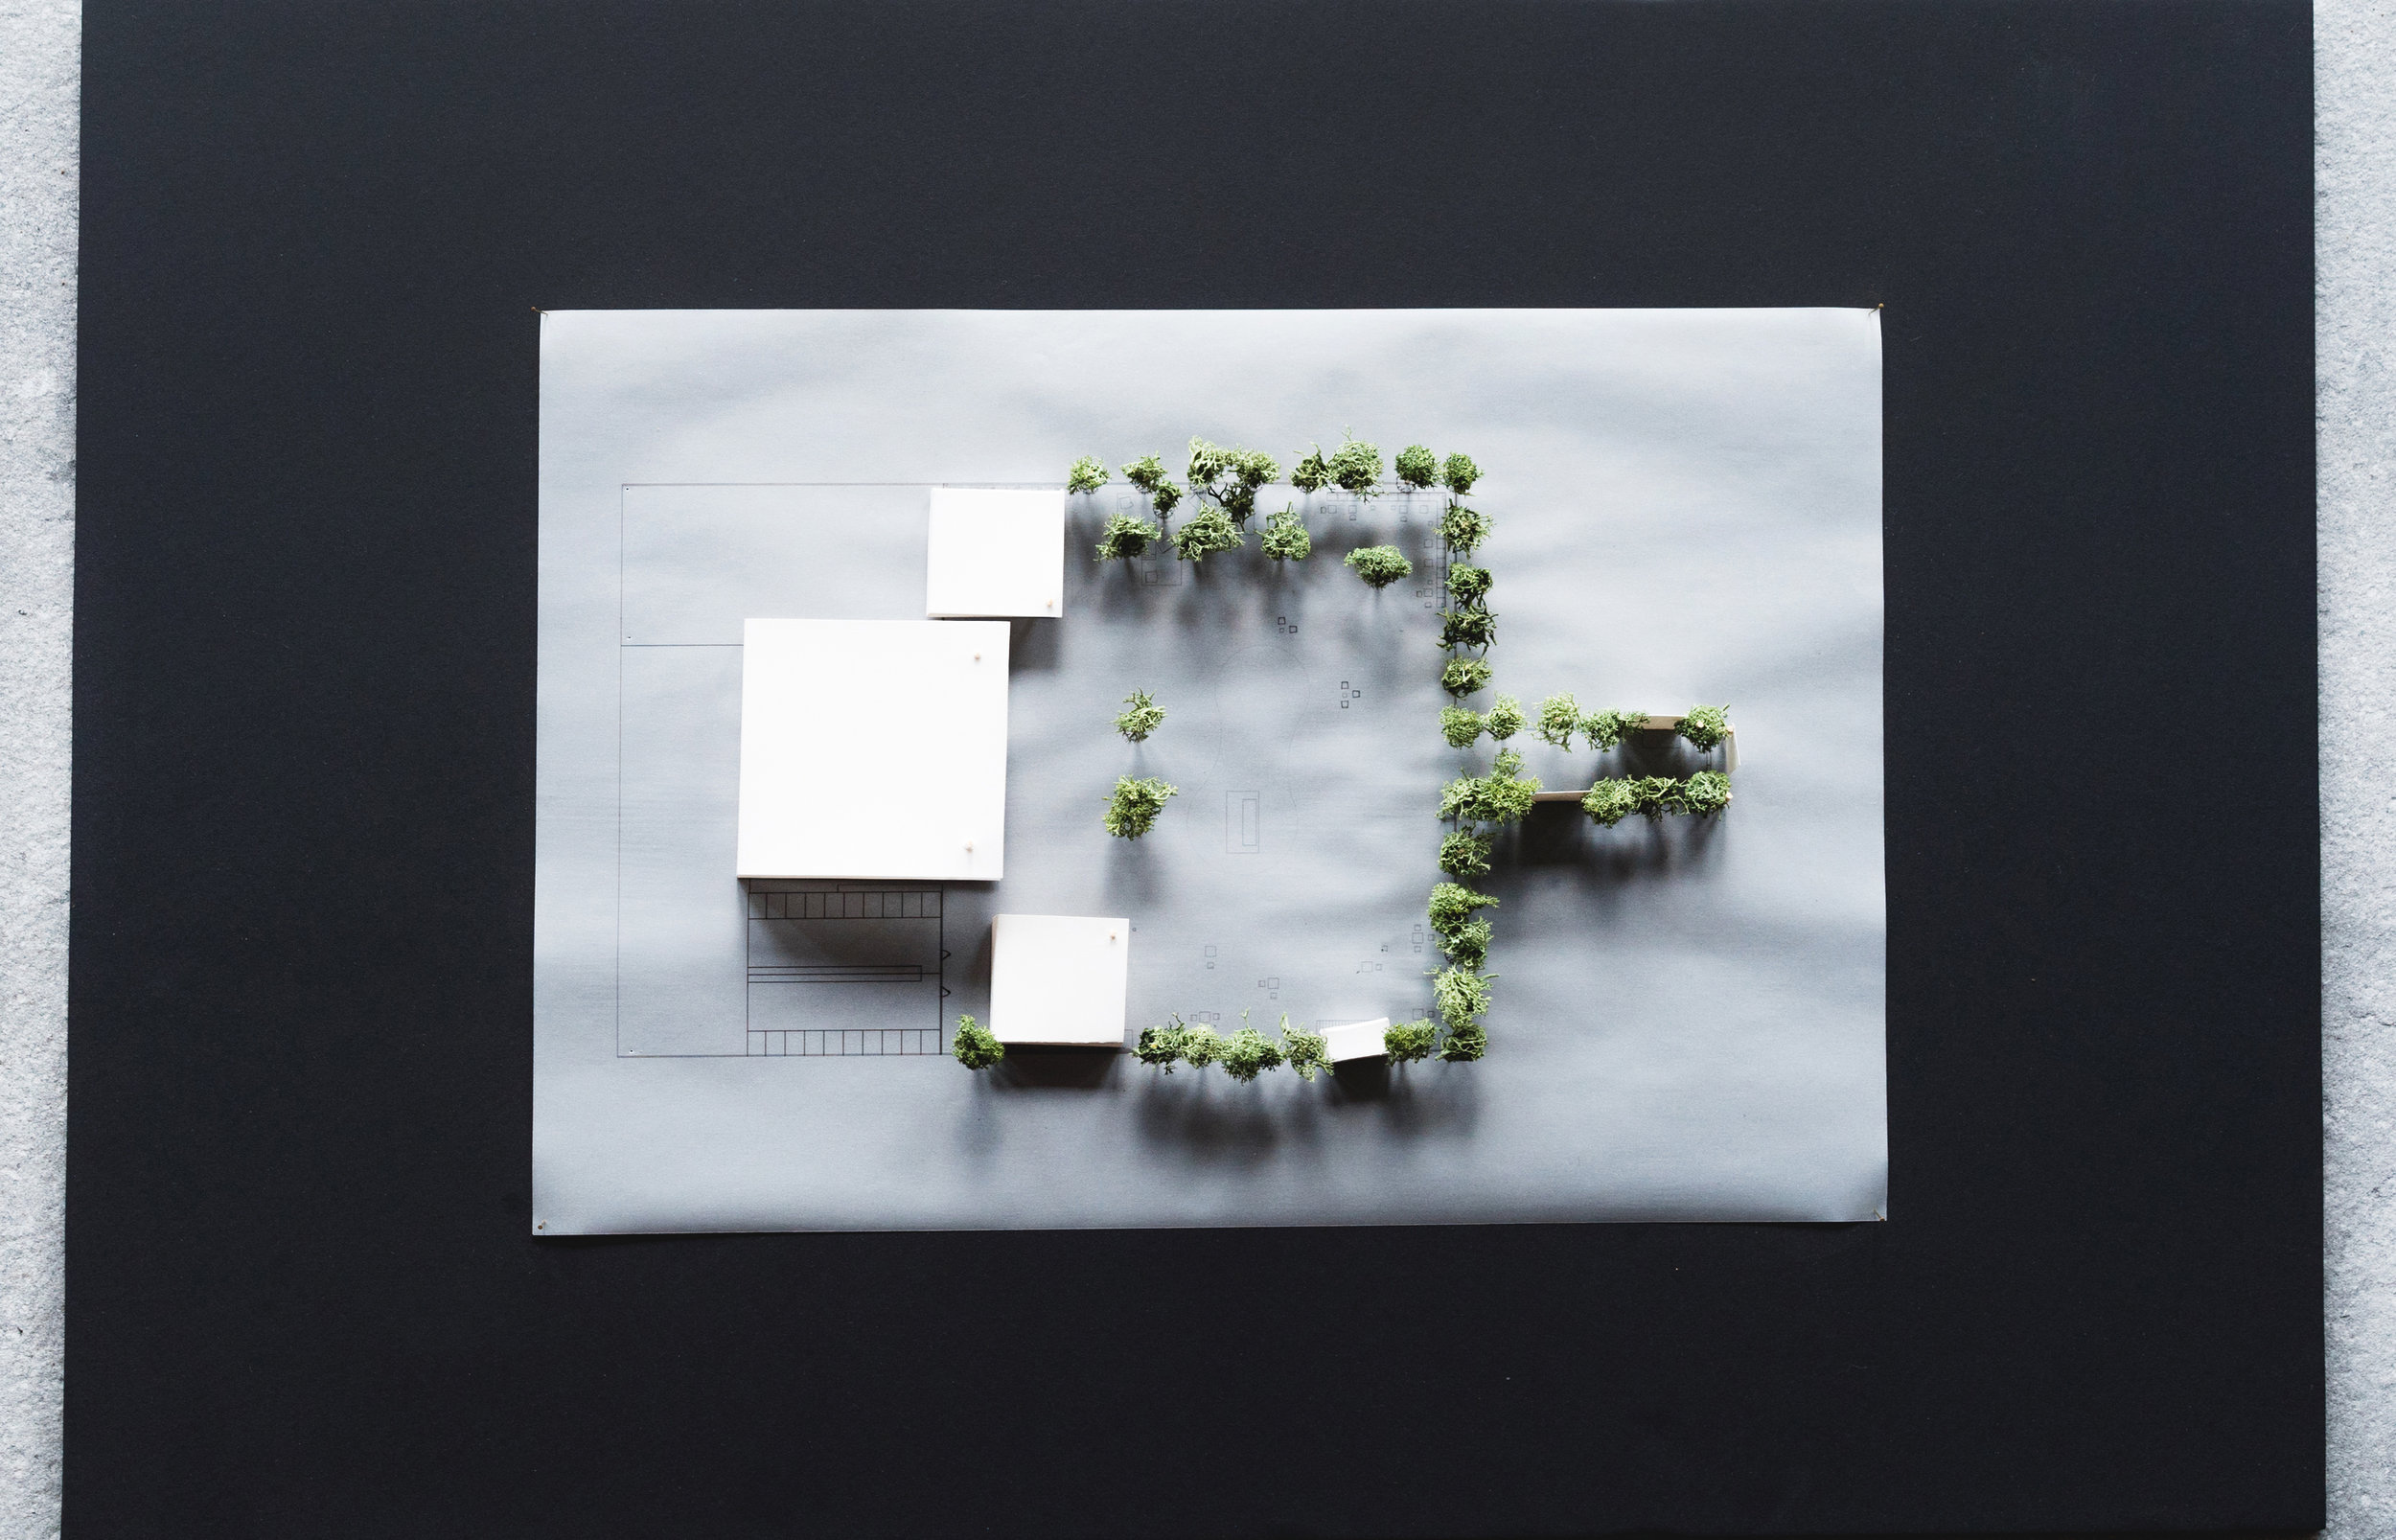 Modern pavilion - contest